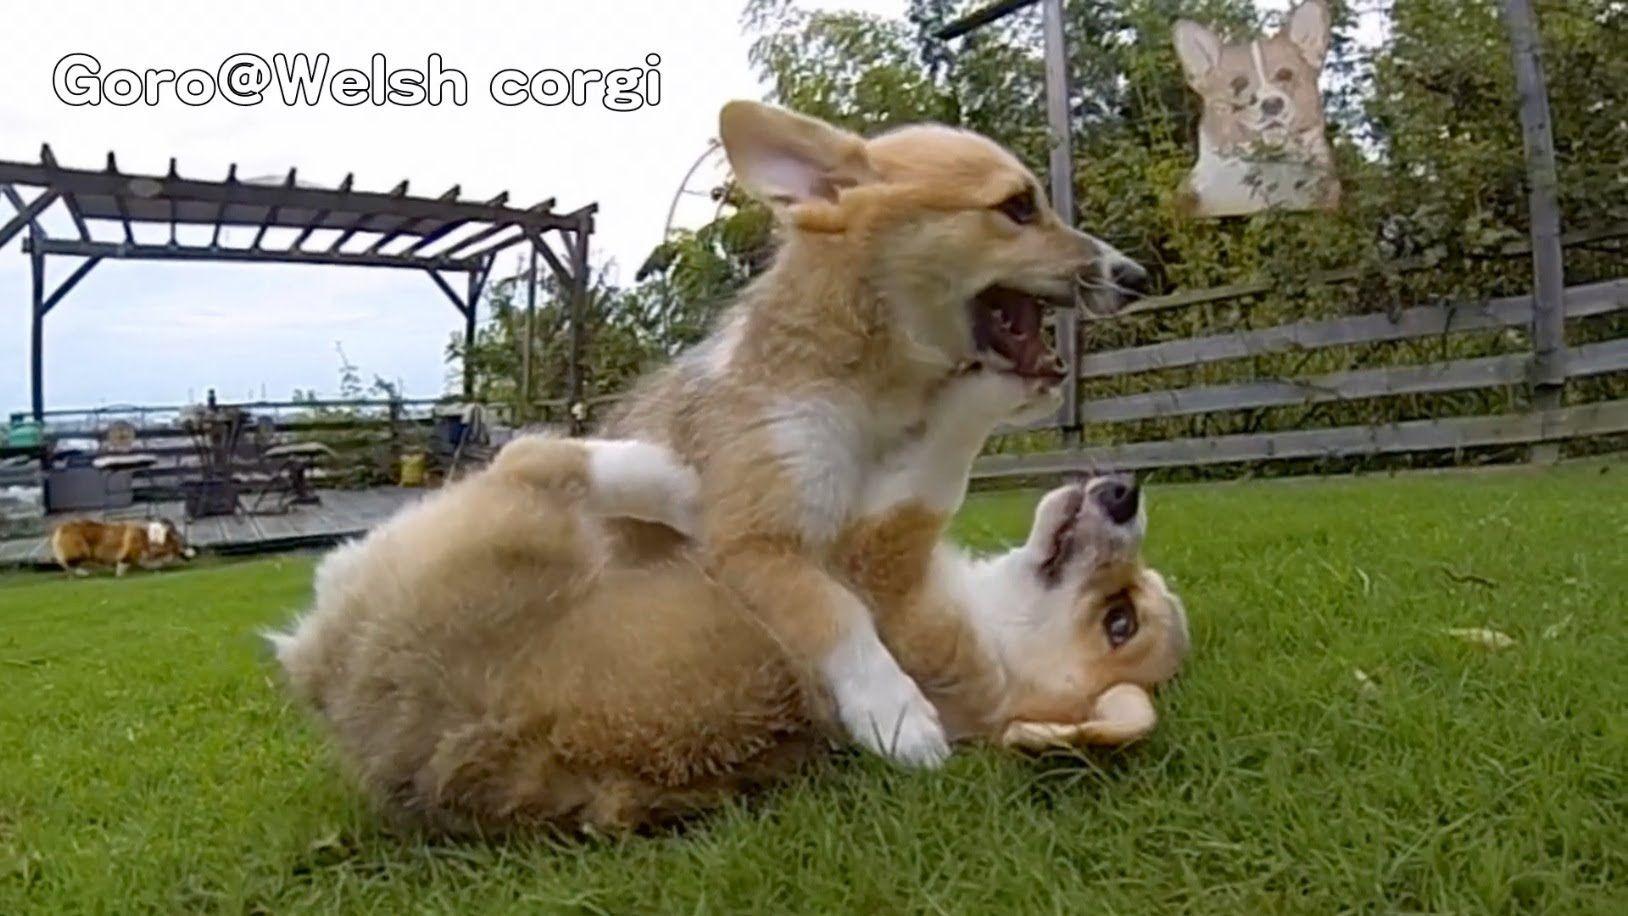 Rocky Puppies / cute corgi puppies on grass / Goro@Welsh corgi channel コ...